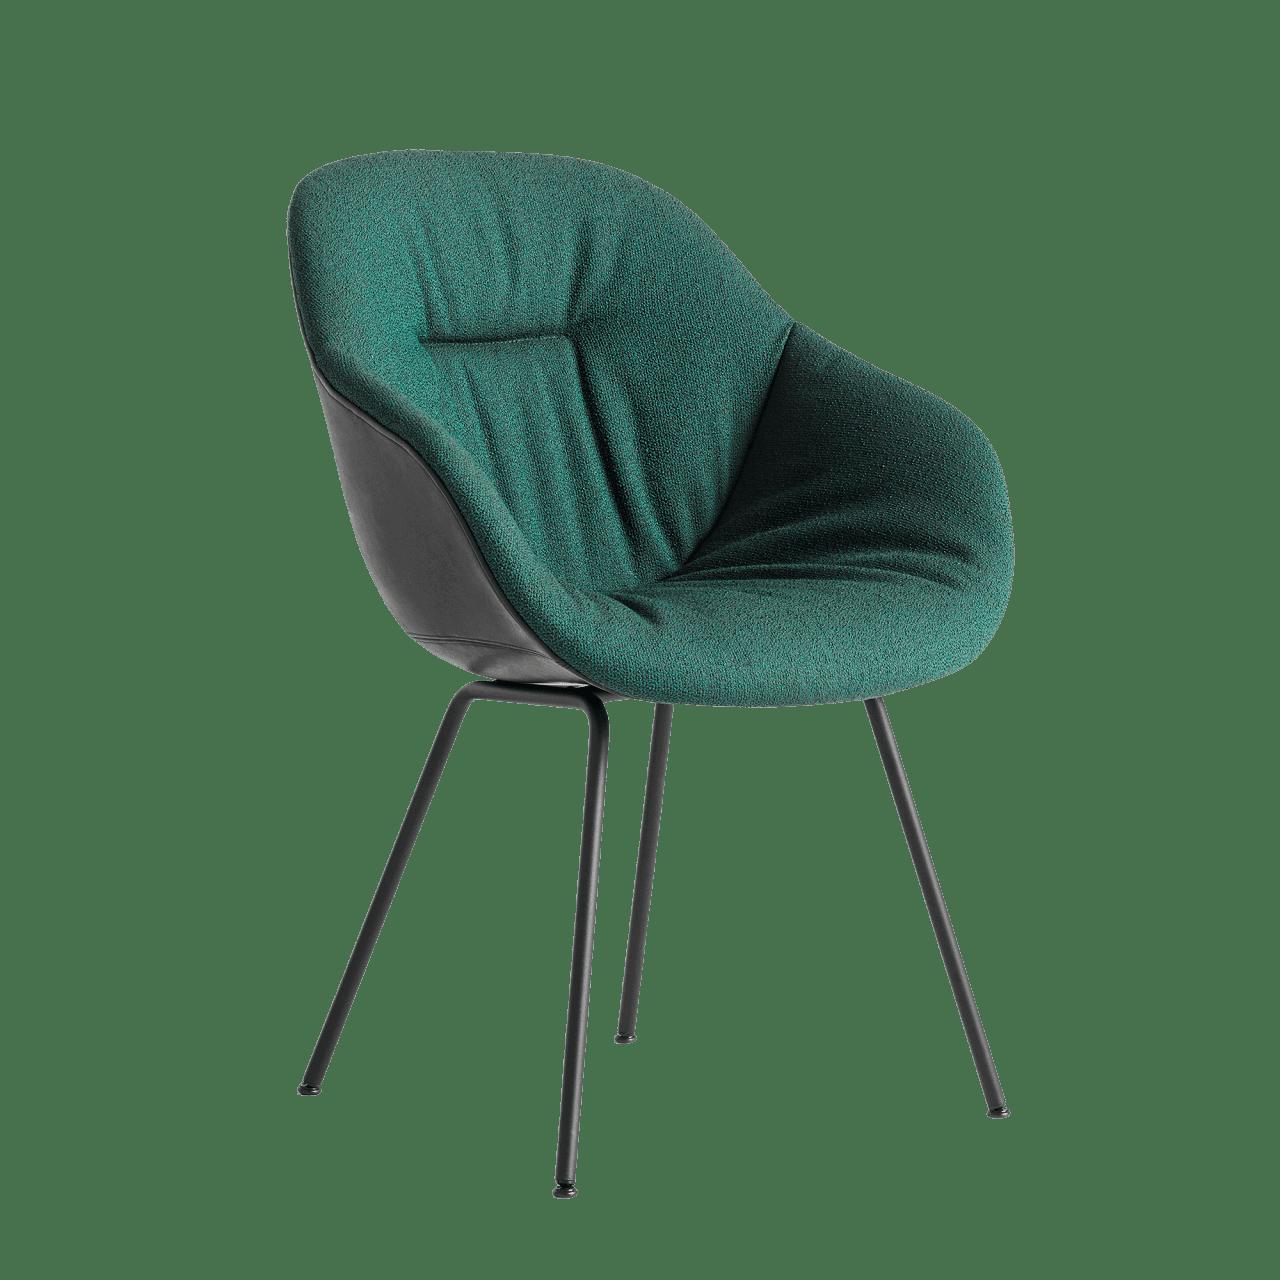 About A Chair 127 Soft Duo Armlehnstuhl